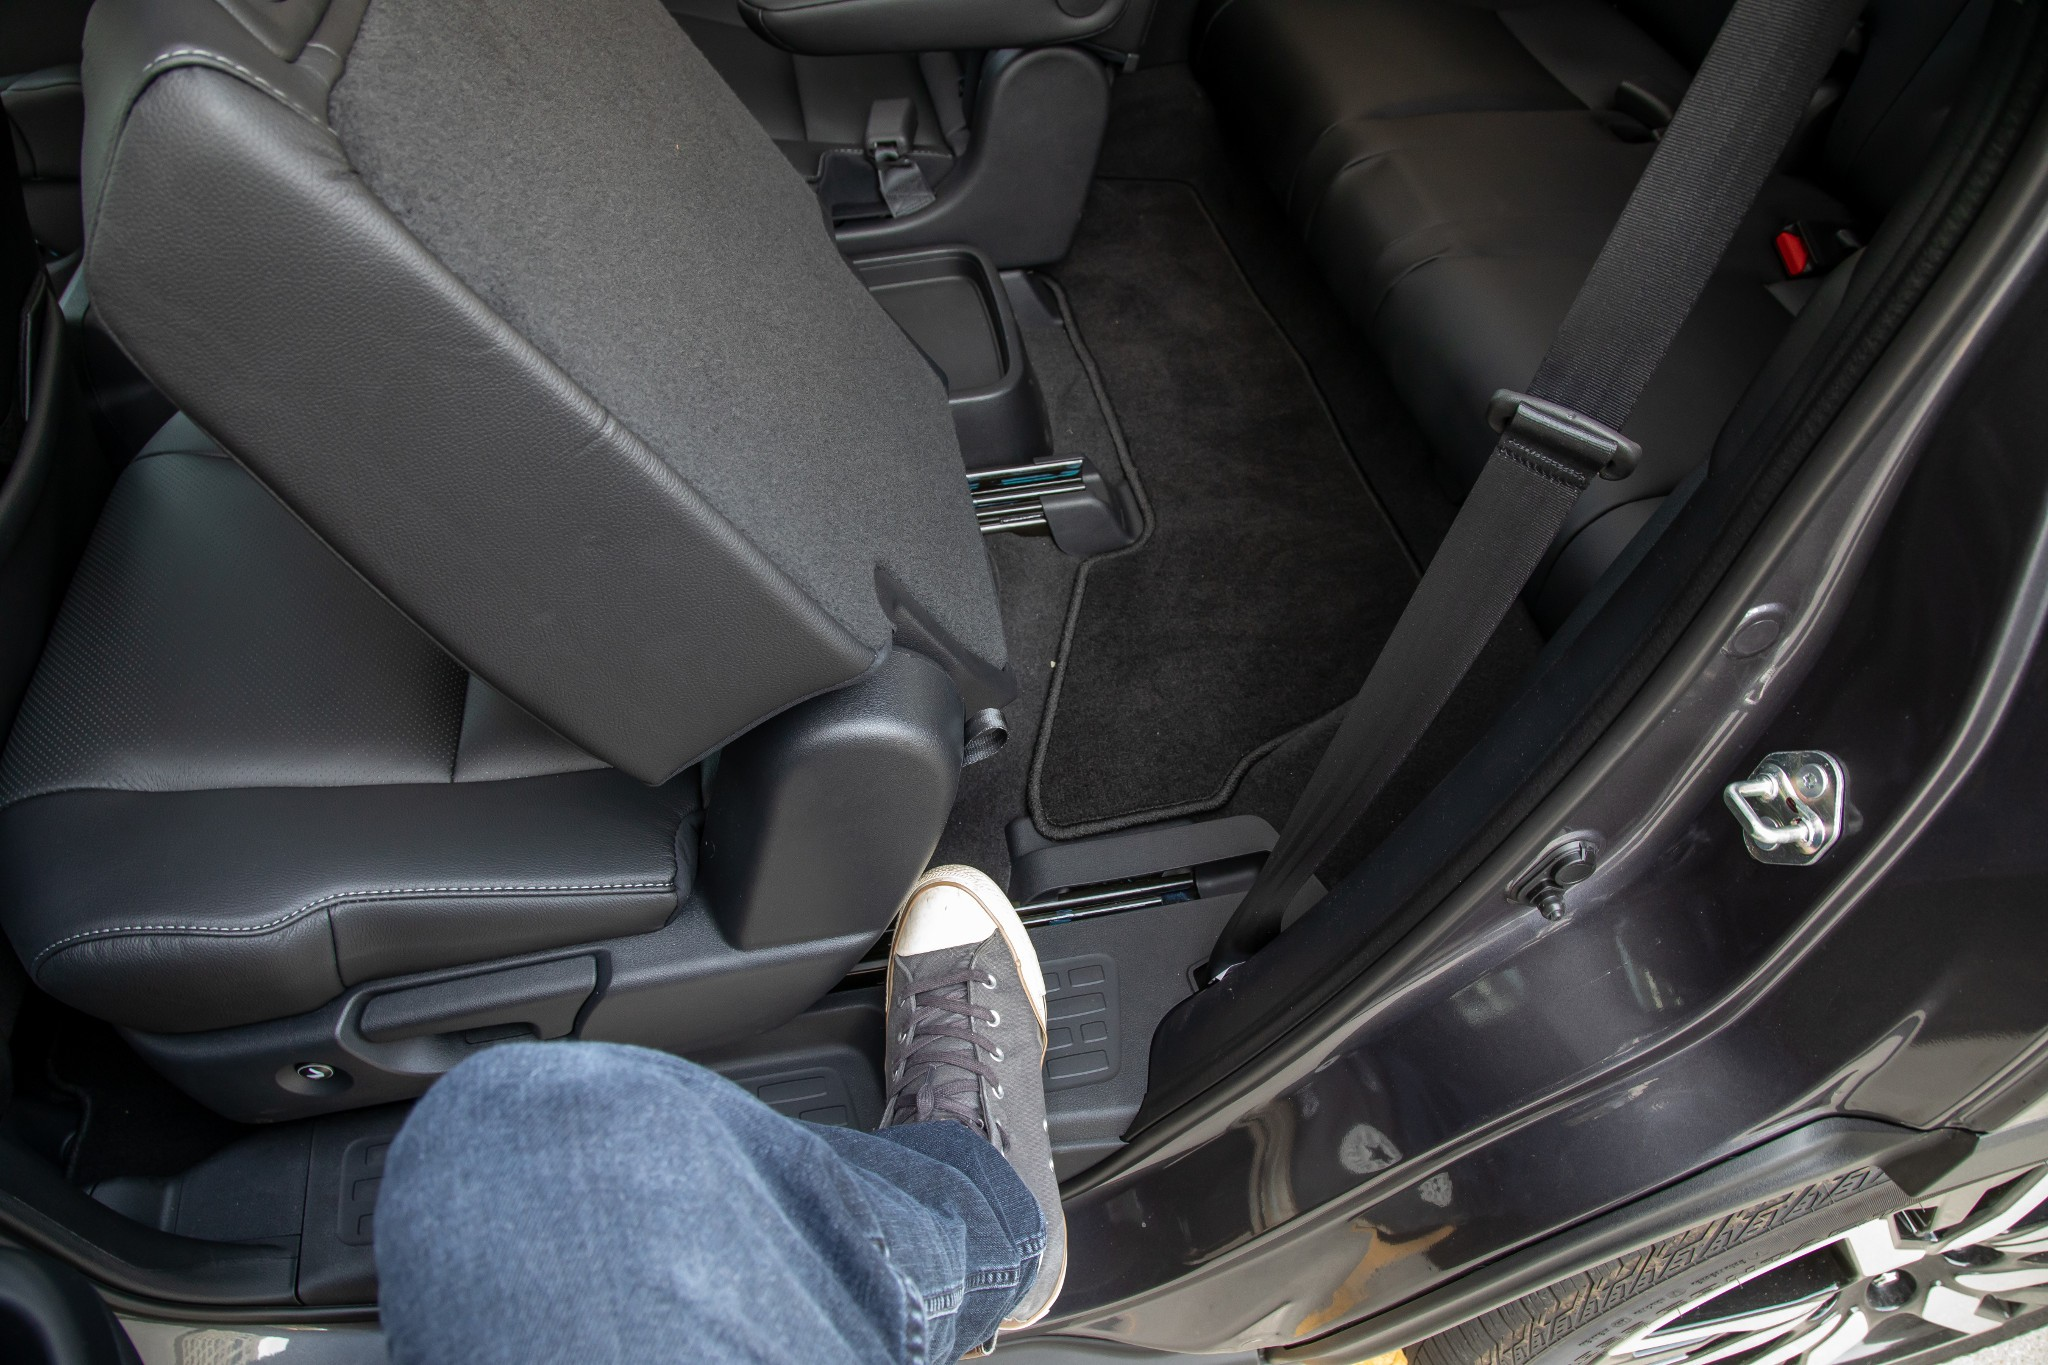 honda-pilot-2020-46-interior--second-row--third-row-access.jpg